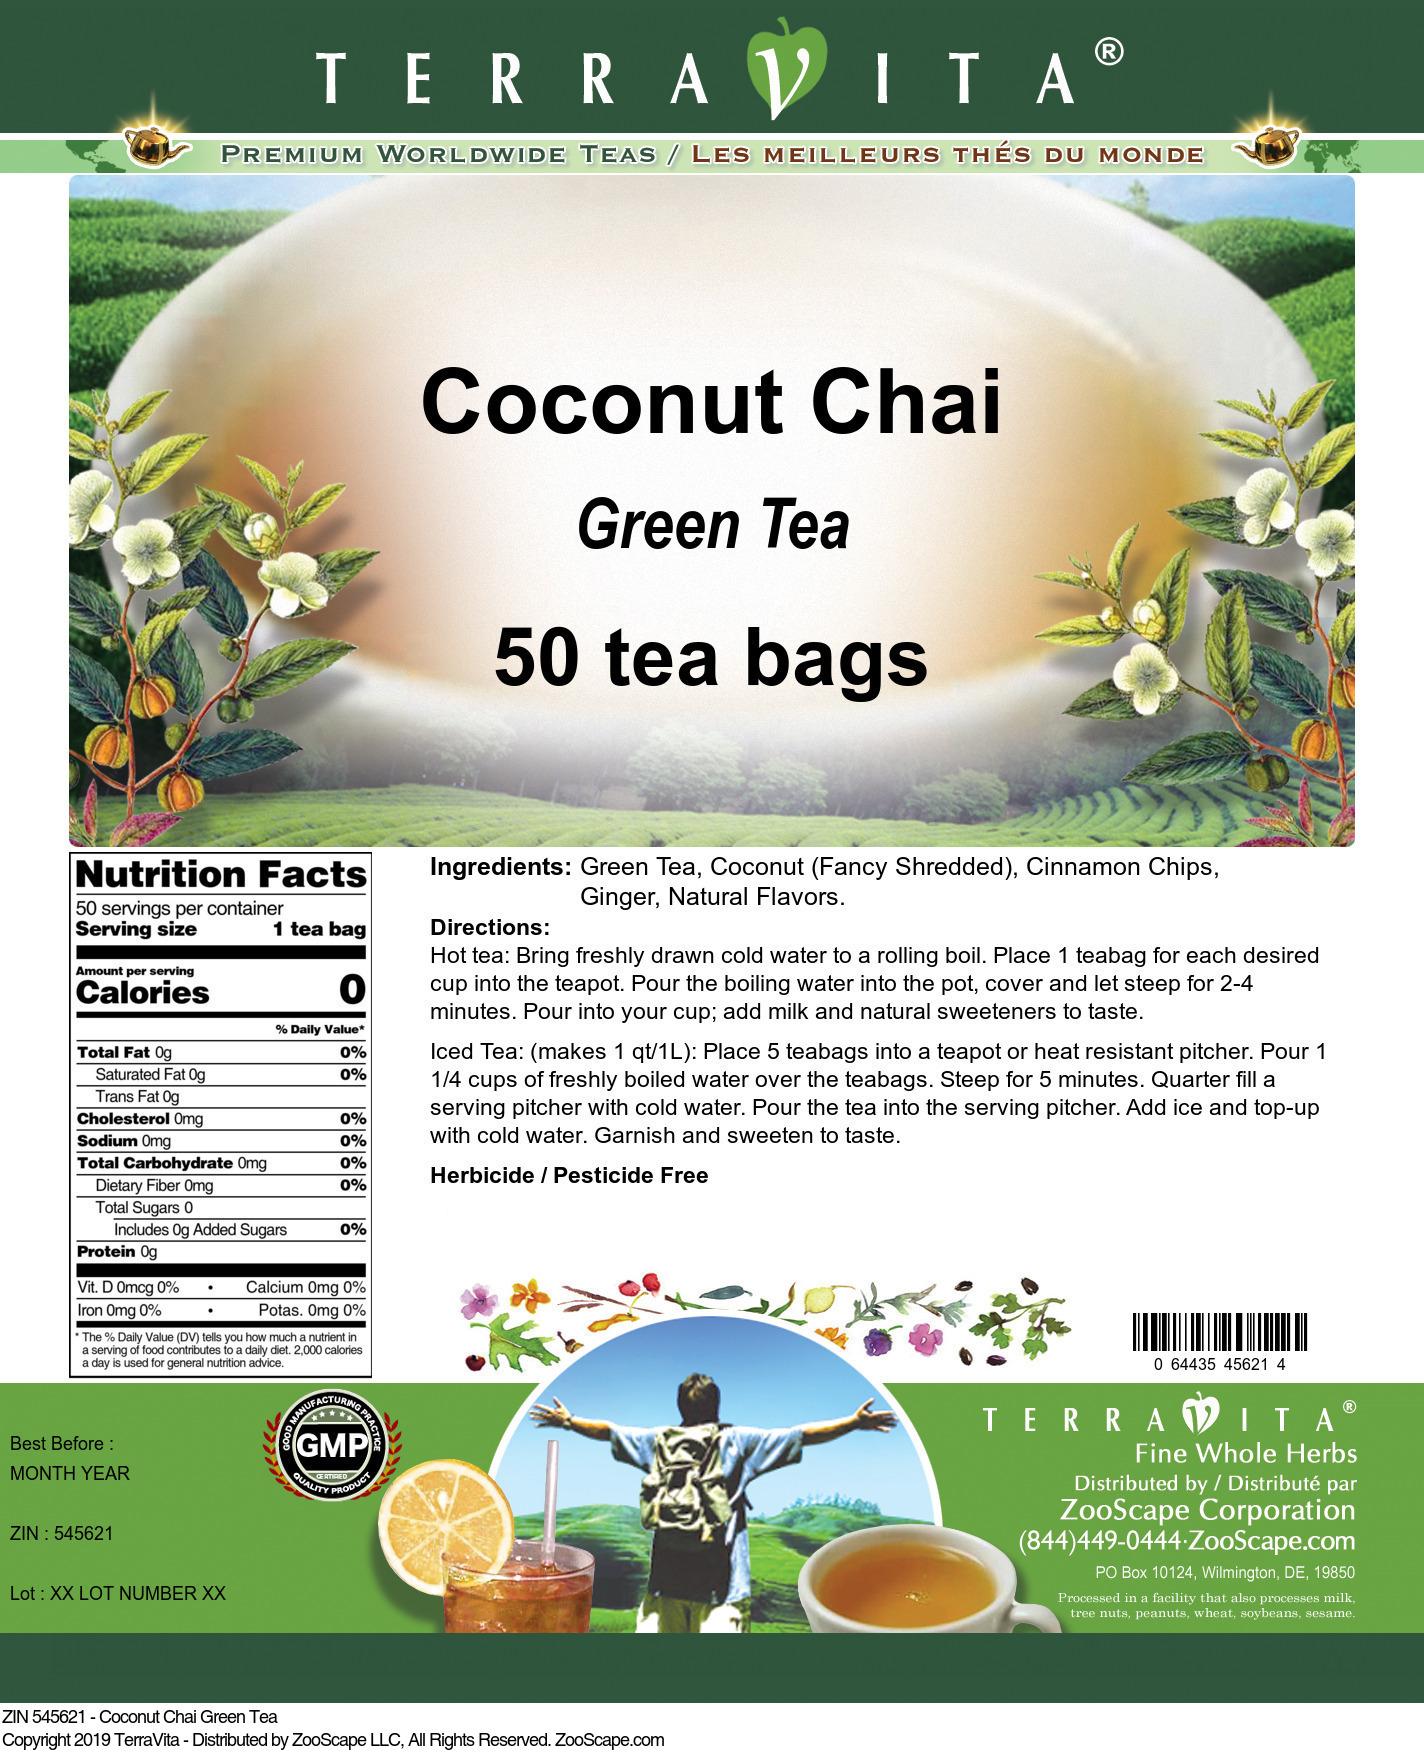 Coconut Chai Green Tea